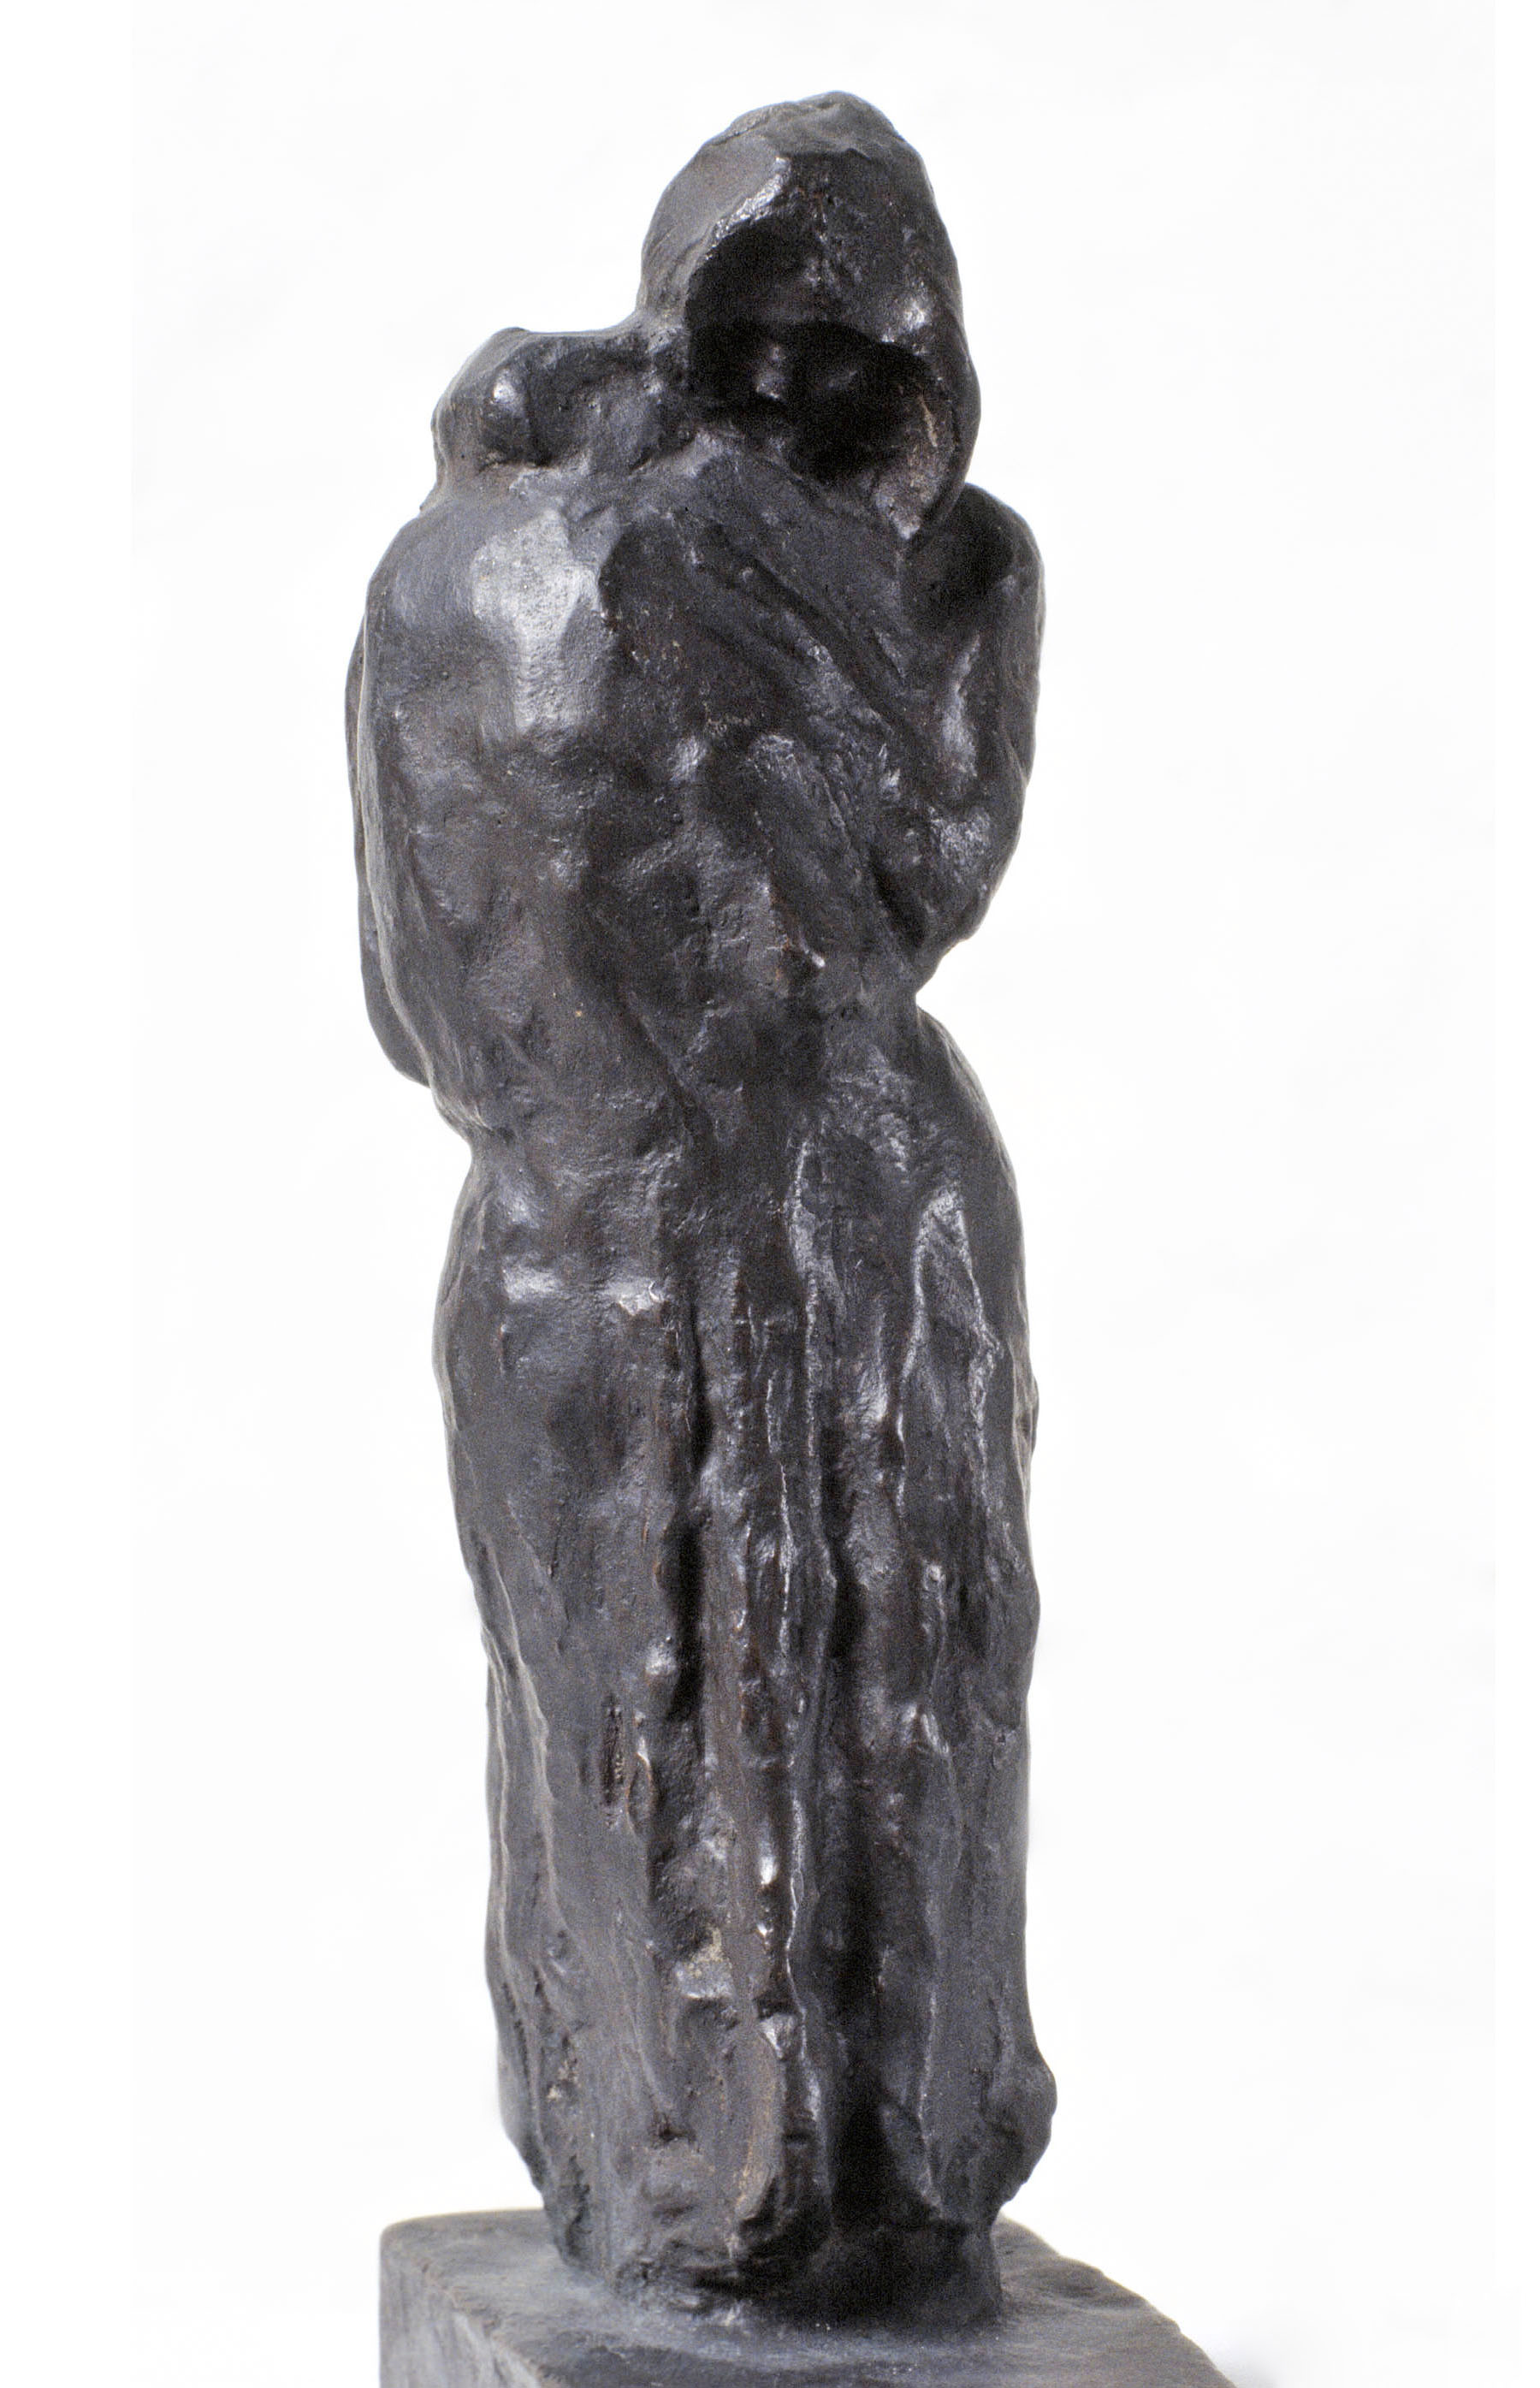 Juli González - Petita maternitat amb caputxa - 1906